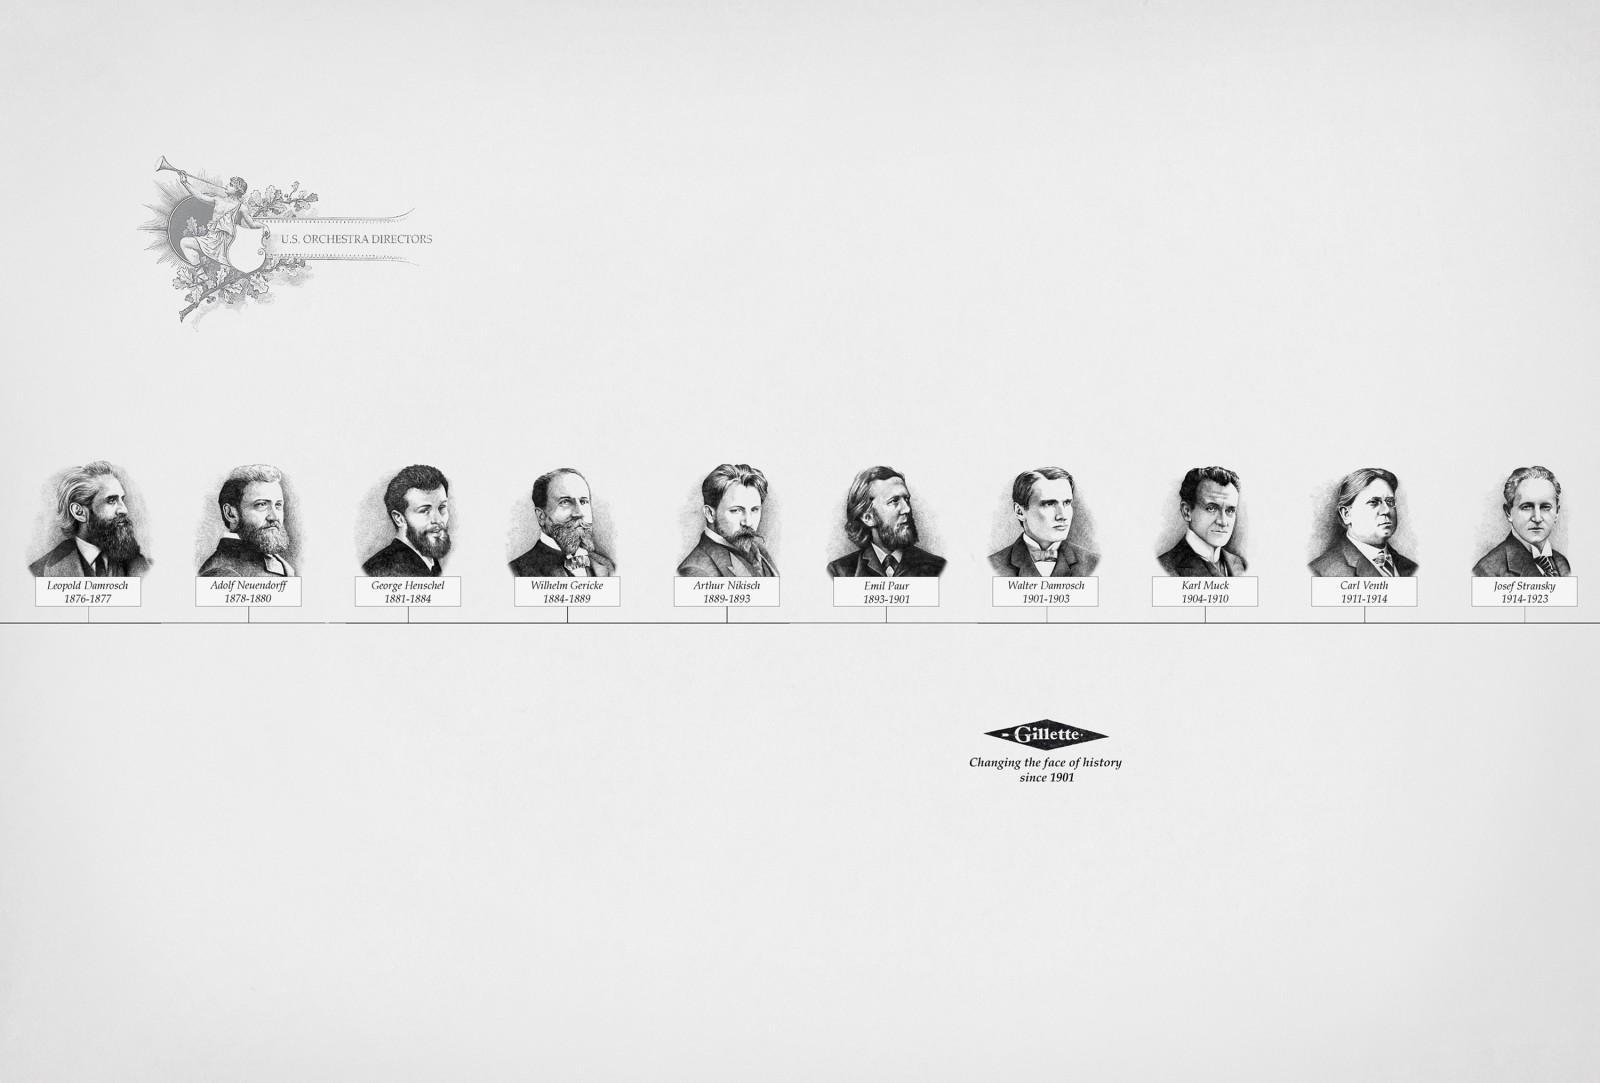 Gillette Print Ad -  True Stories, U.S. Orchestra Directors